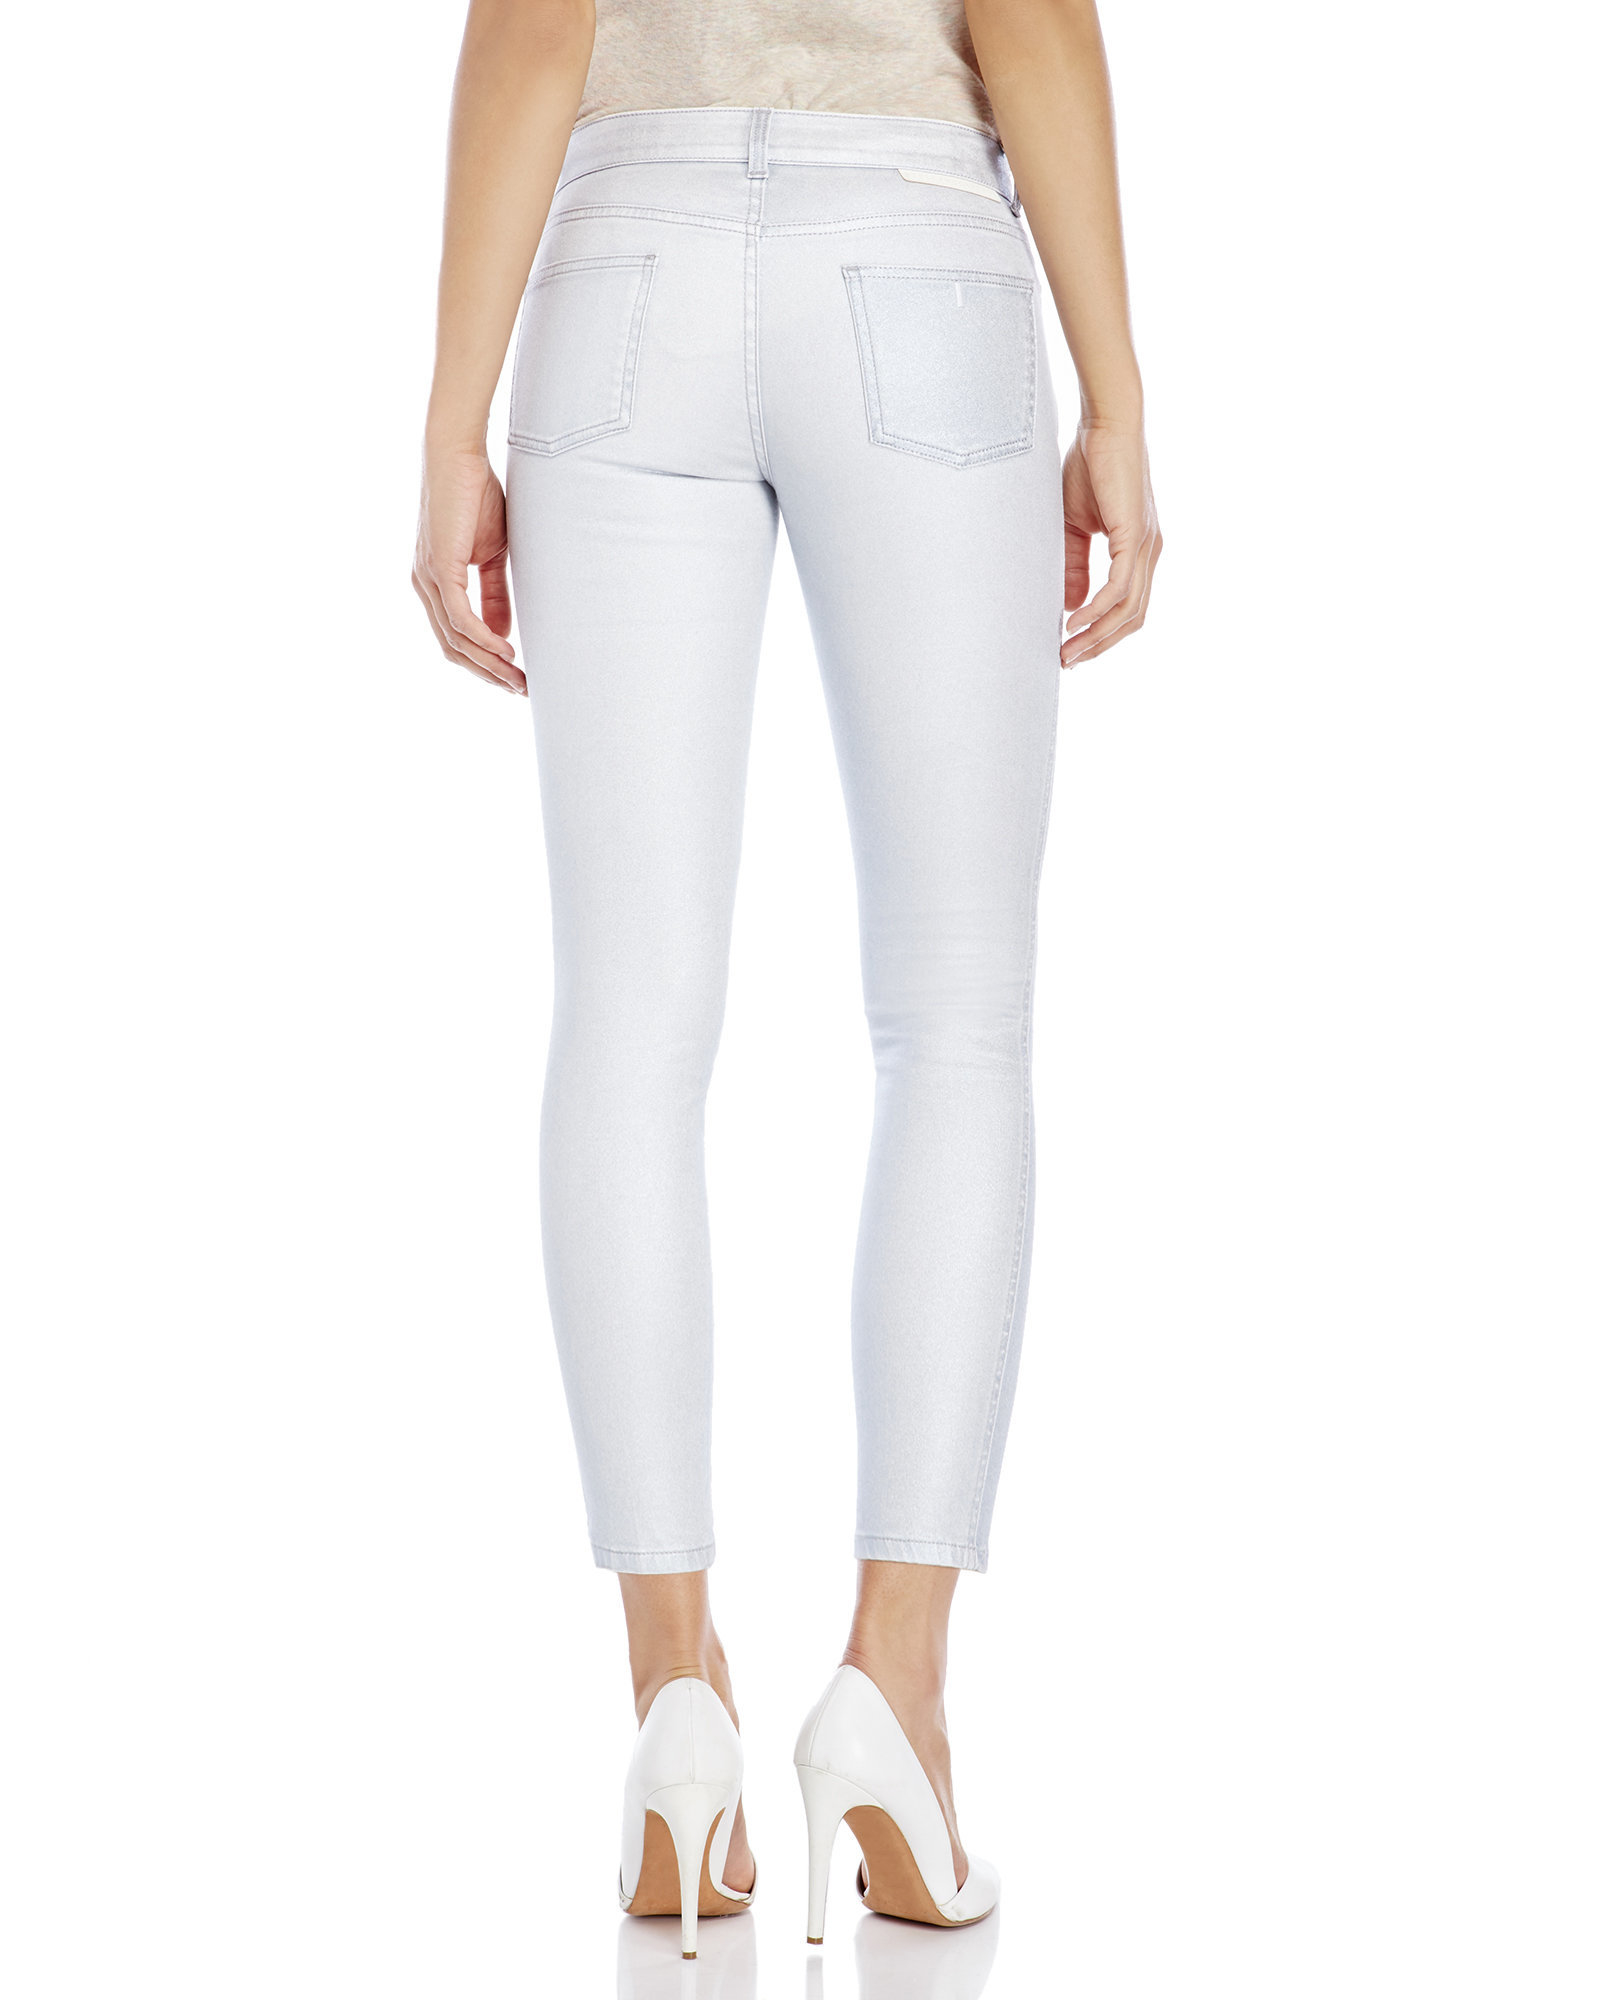 Silver Cropped Jeans - Jon Jean